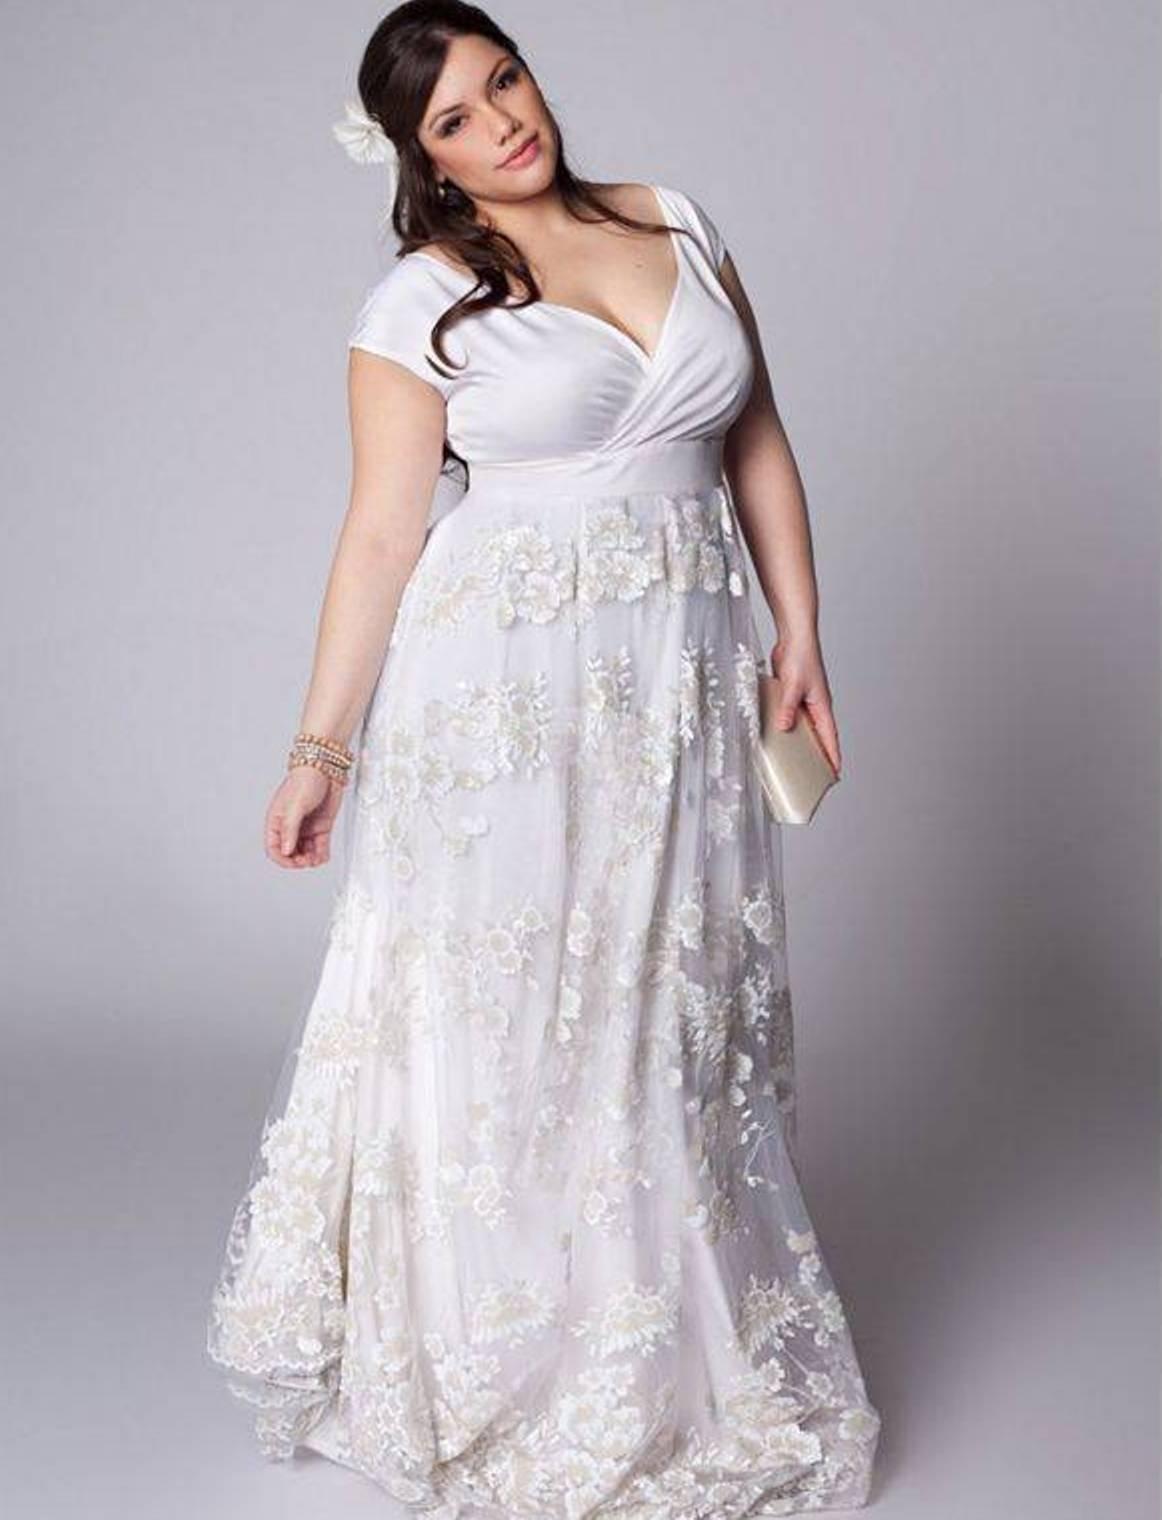 plus size wedding dresses plus size wedding gowns Wedding Dresses for Plus Size Women